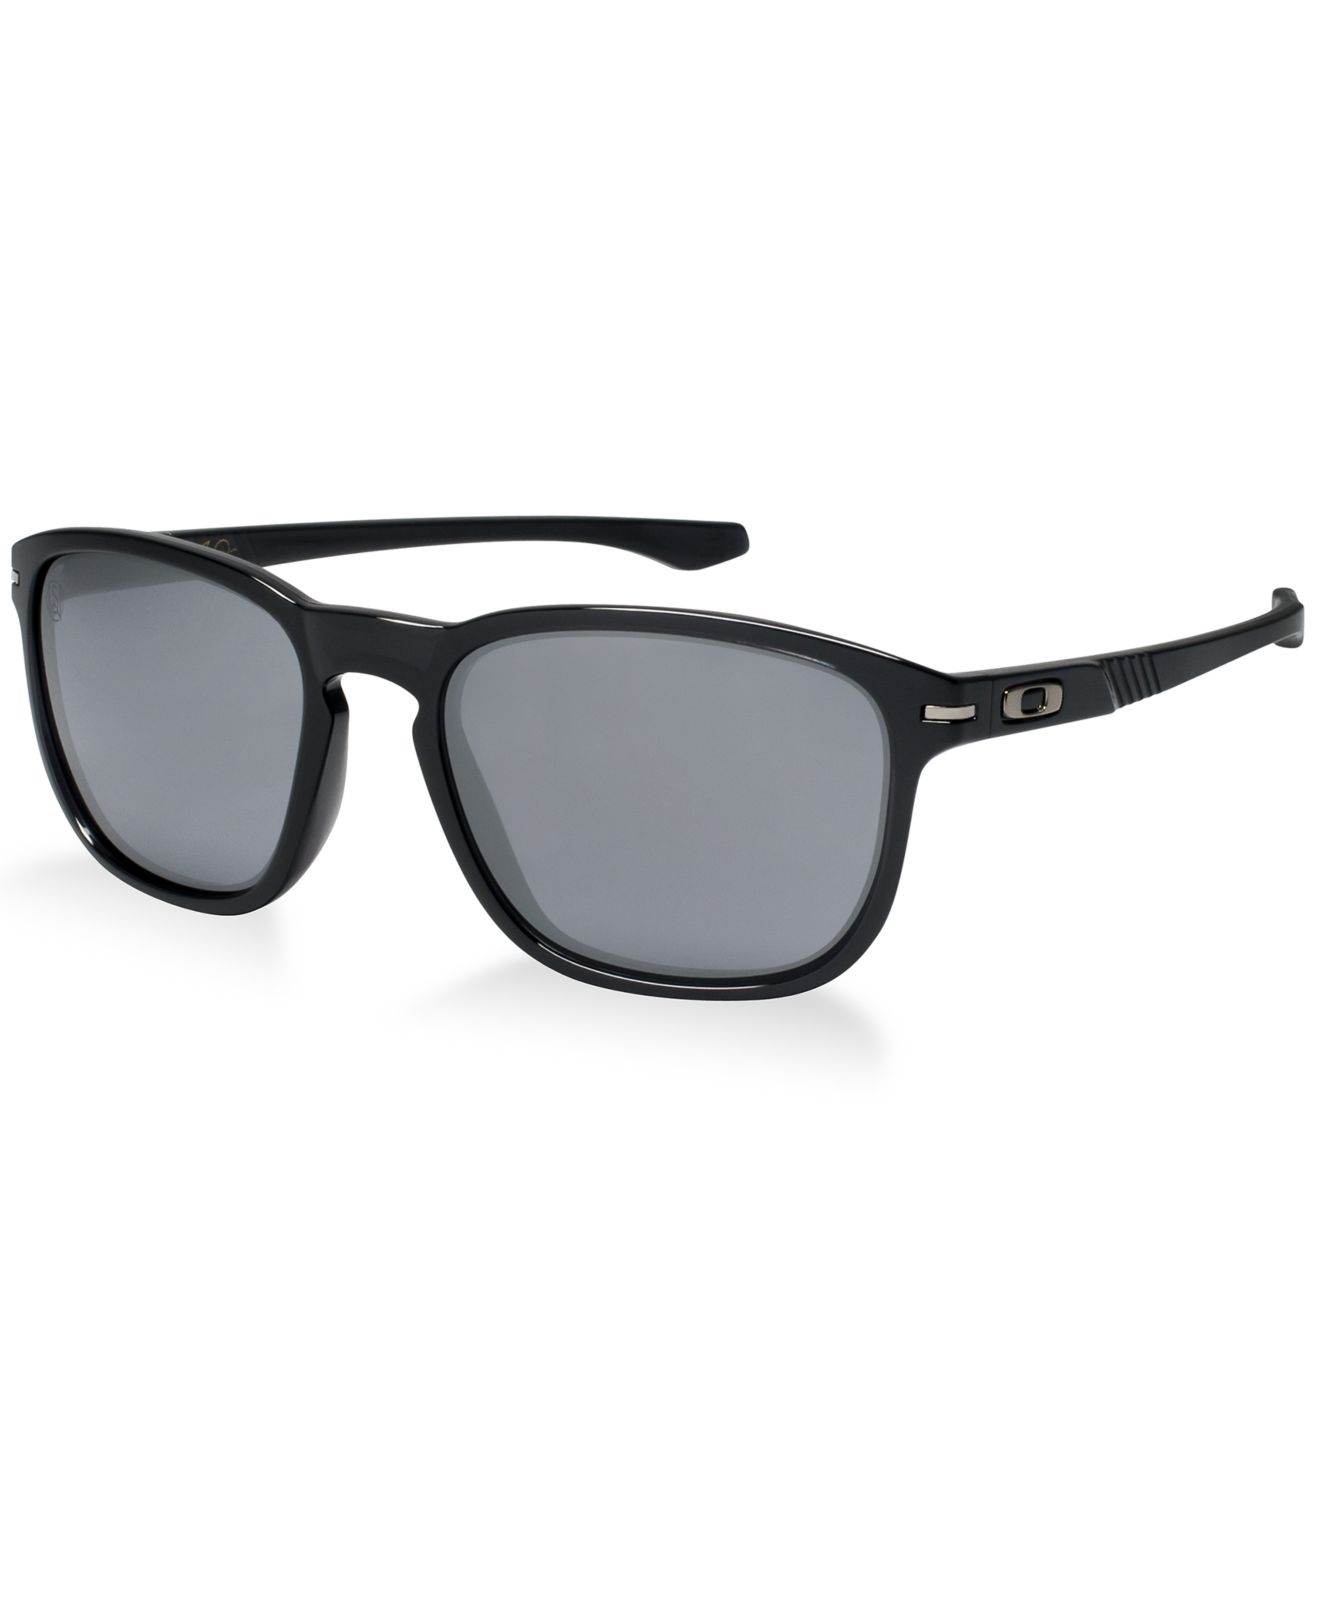 59c90fdc09 Oakley Sunglasses Oo9223 Enduro 922319